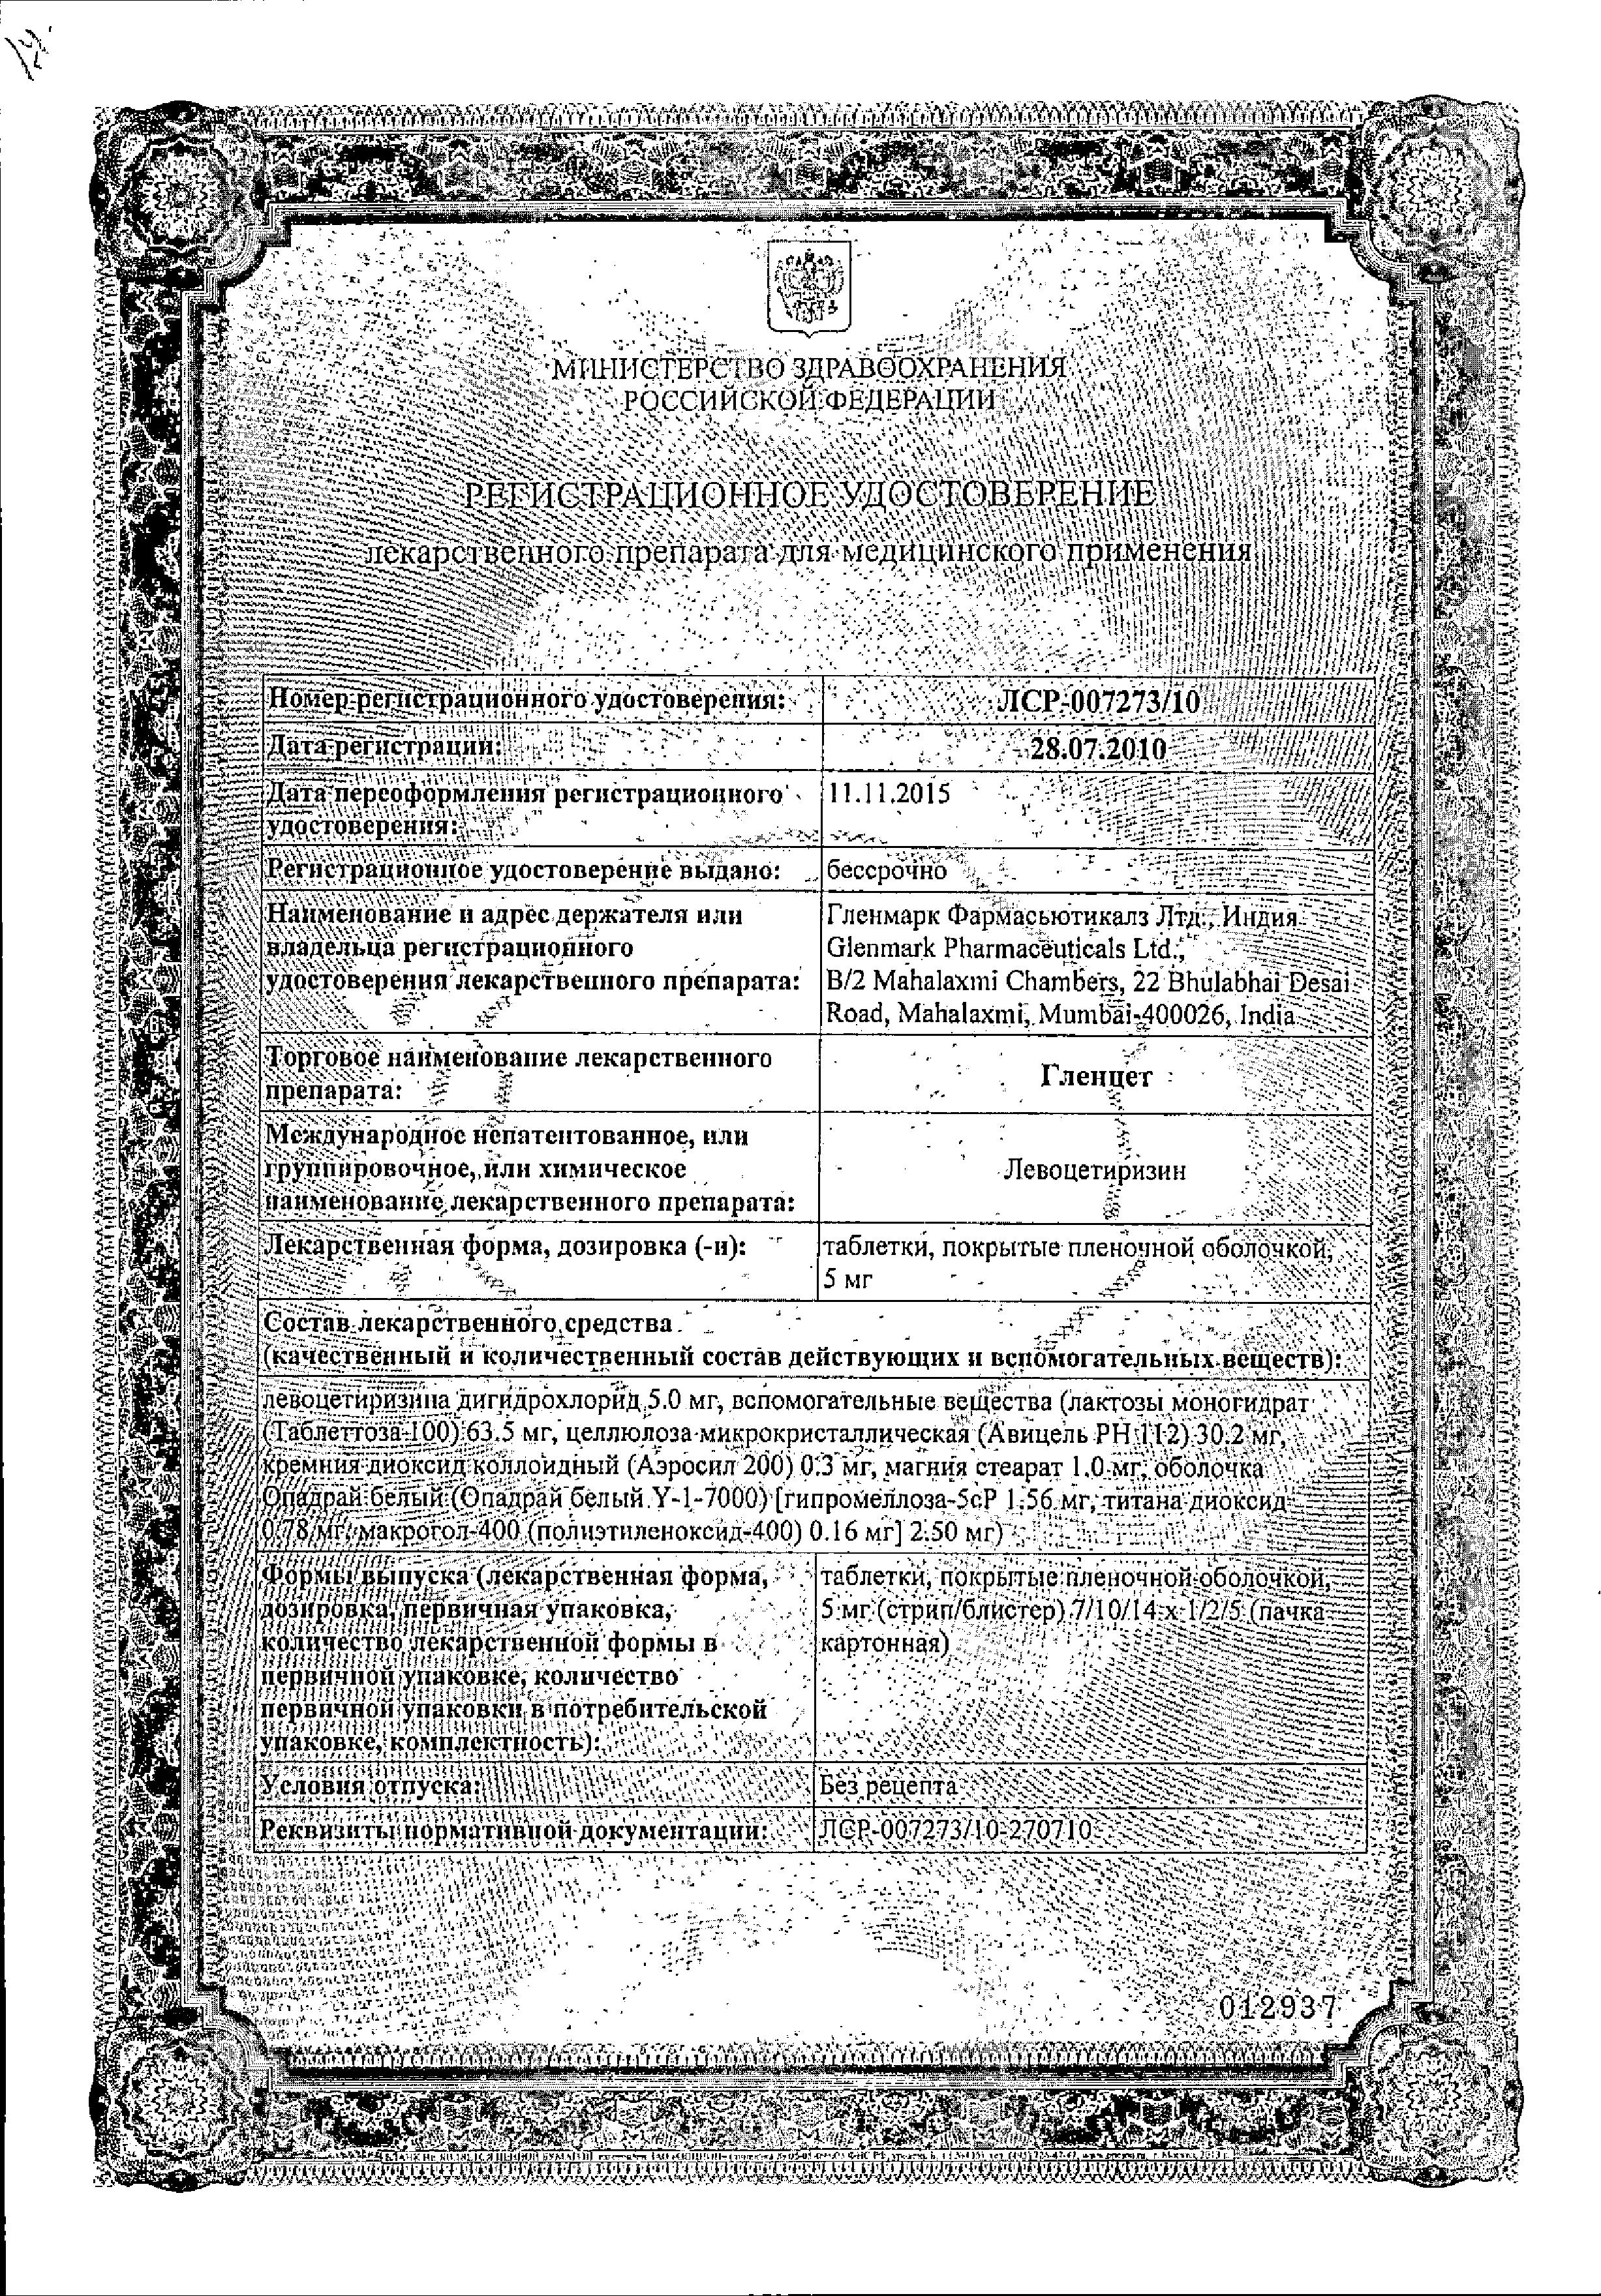 Гленцет сертификат